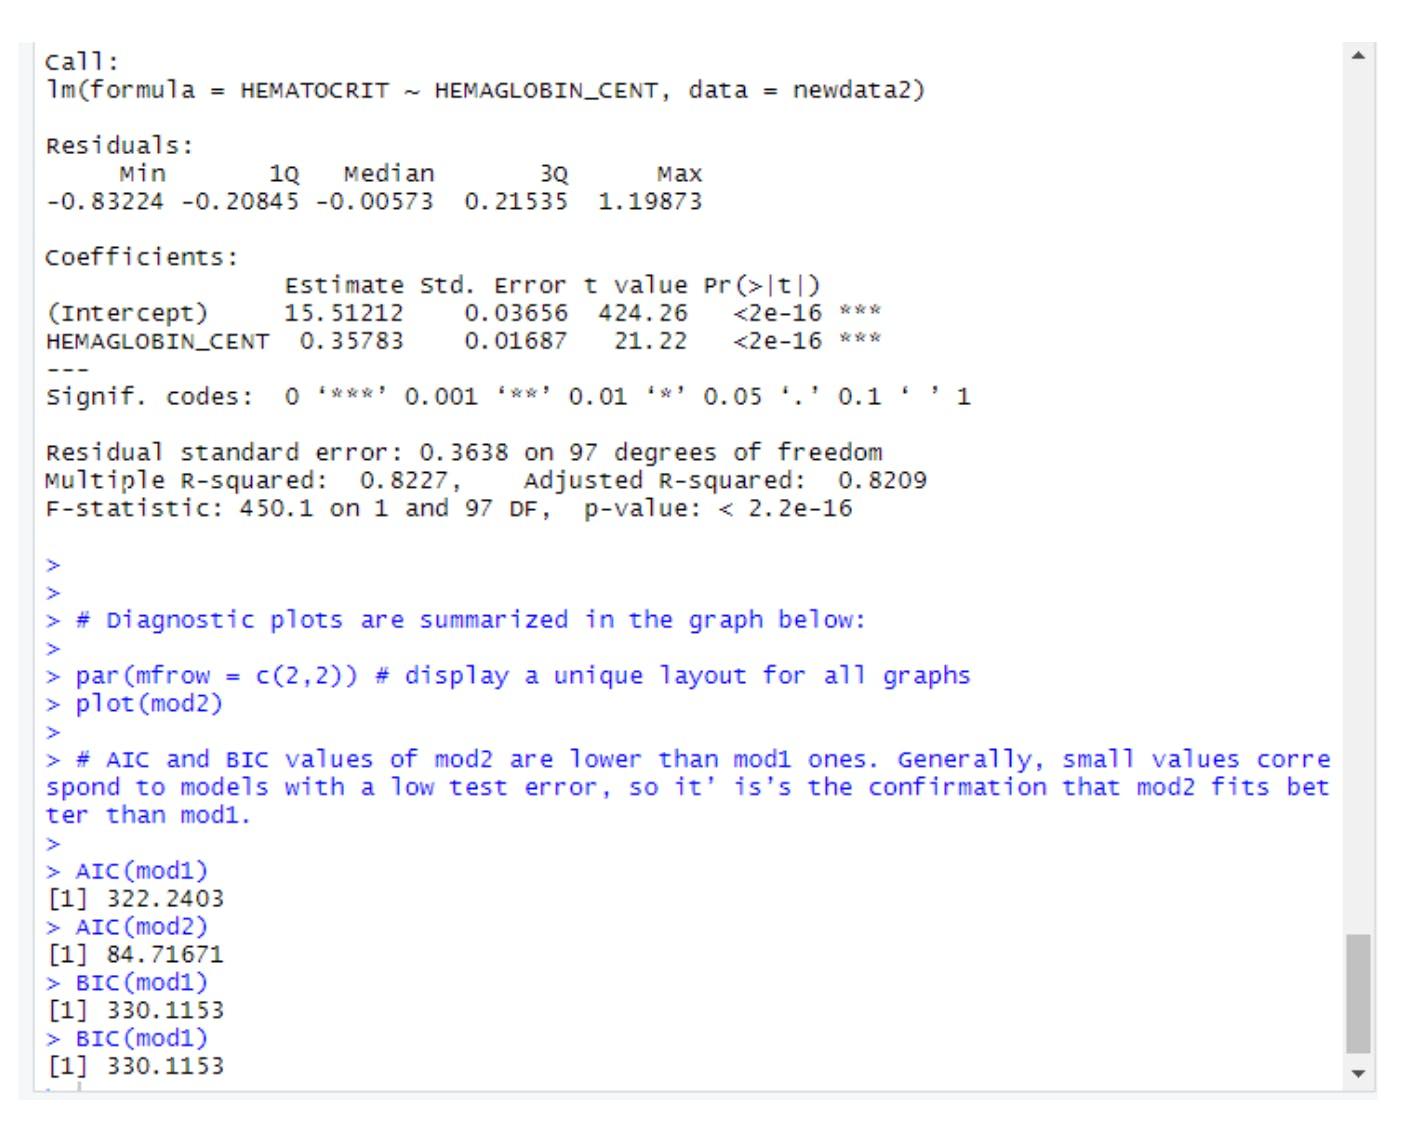 Screenshot 2021-05-18 at 5.30.45 PM.png